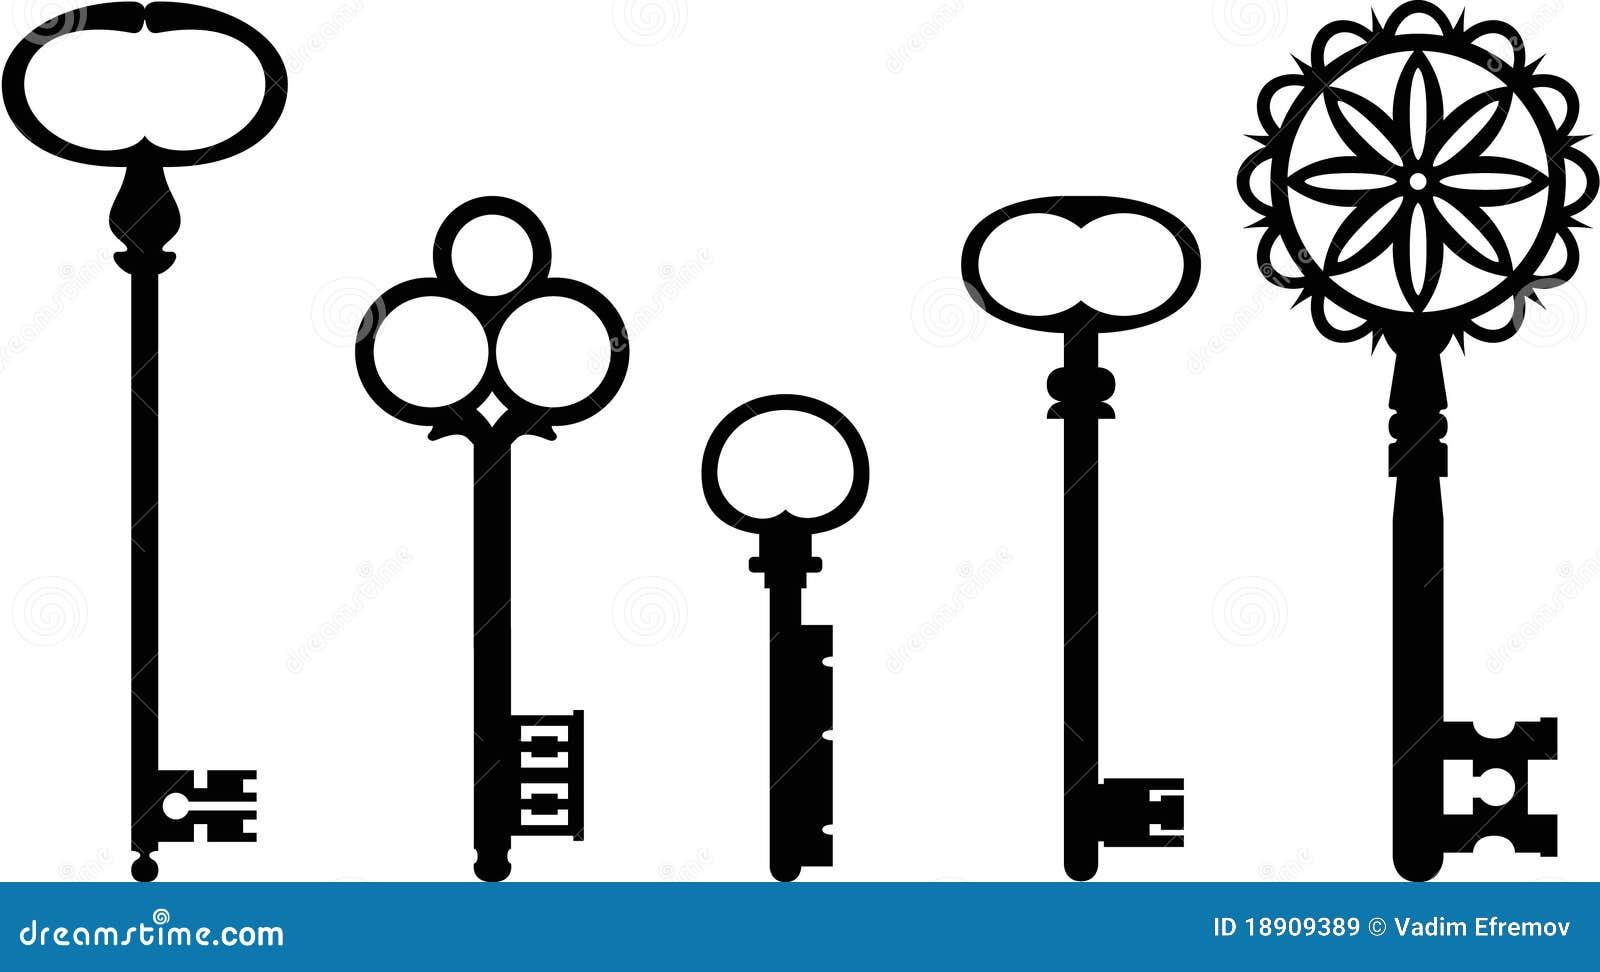 Vintage Key Clip Art Vintage keys